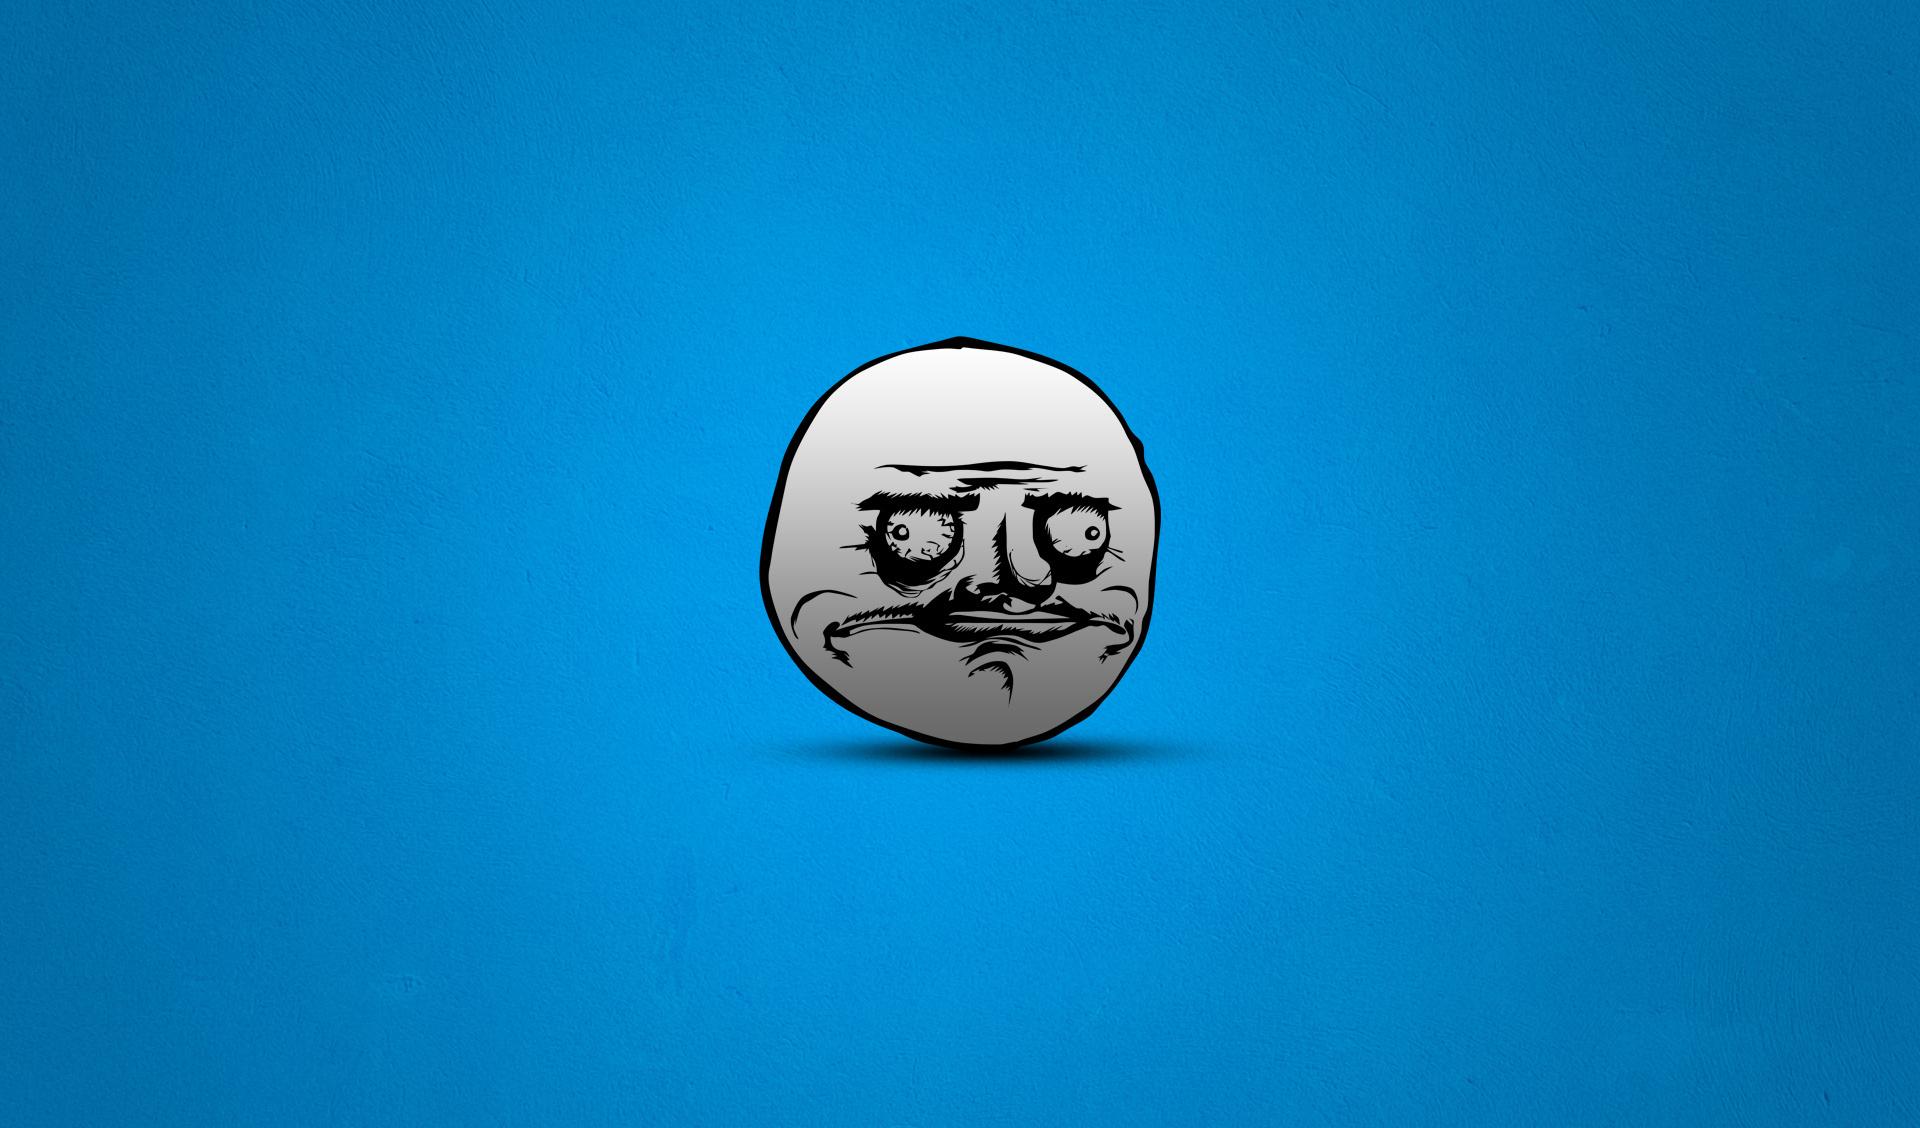 Troll Face Wallpaper Iphone Troll Face Fond D 233 Cran Hd Arri 232 Re Plan 1920x1128 Id